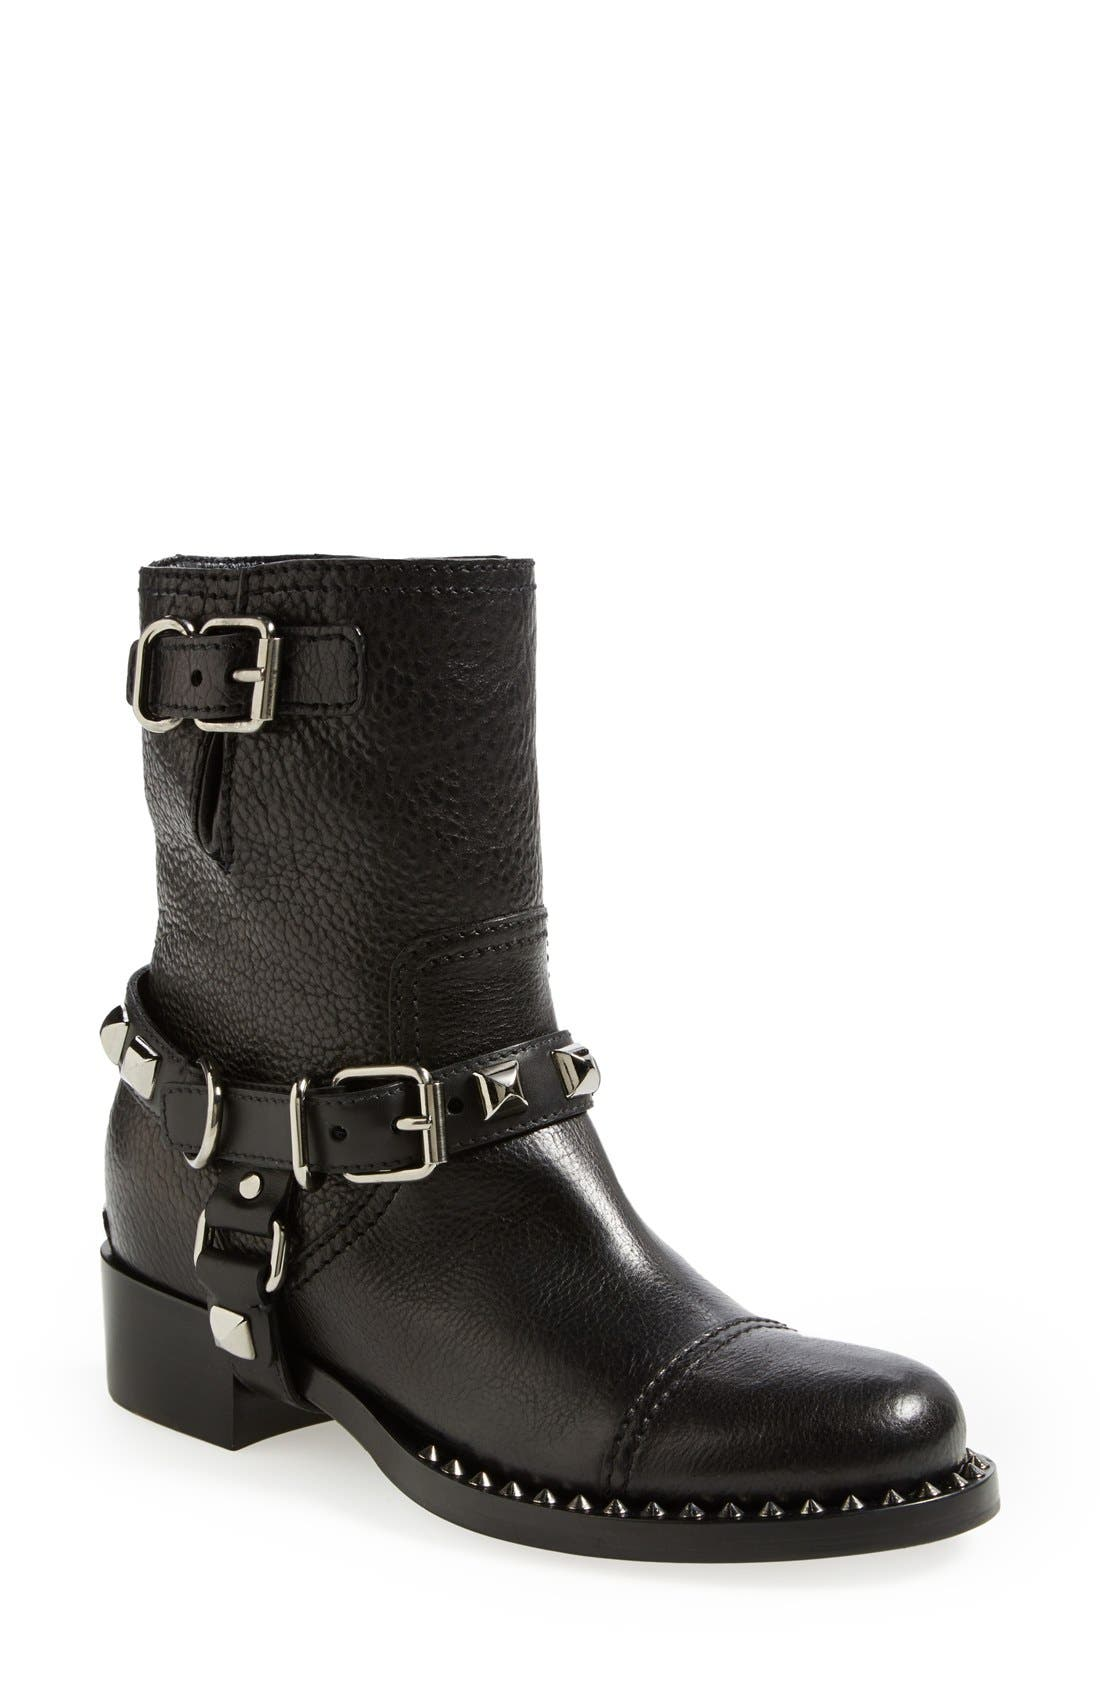 Main Image - Miu Miu Studded Harness Moto Boot (Women)